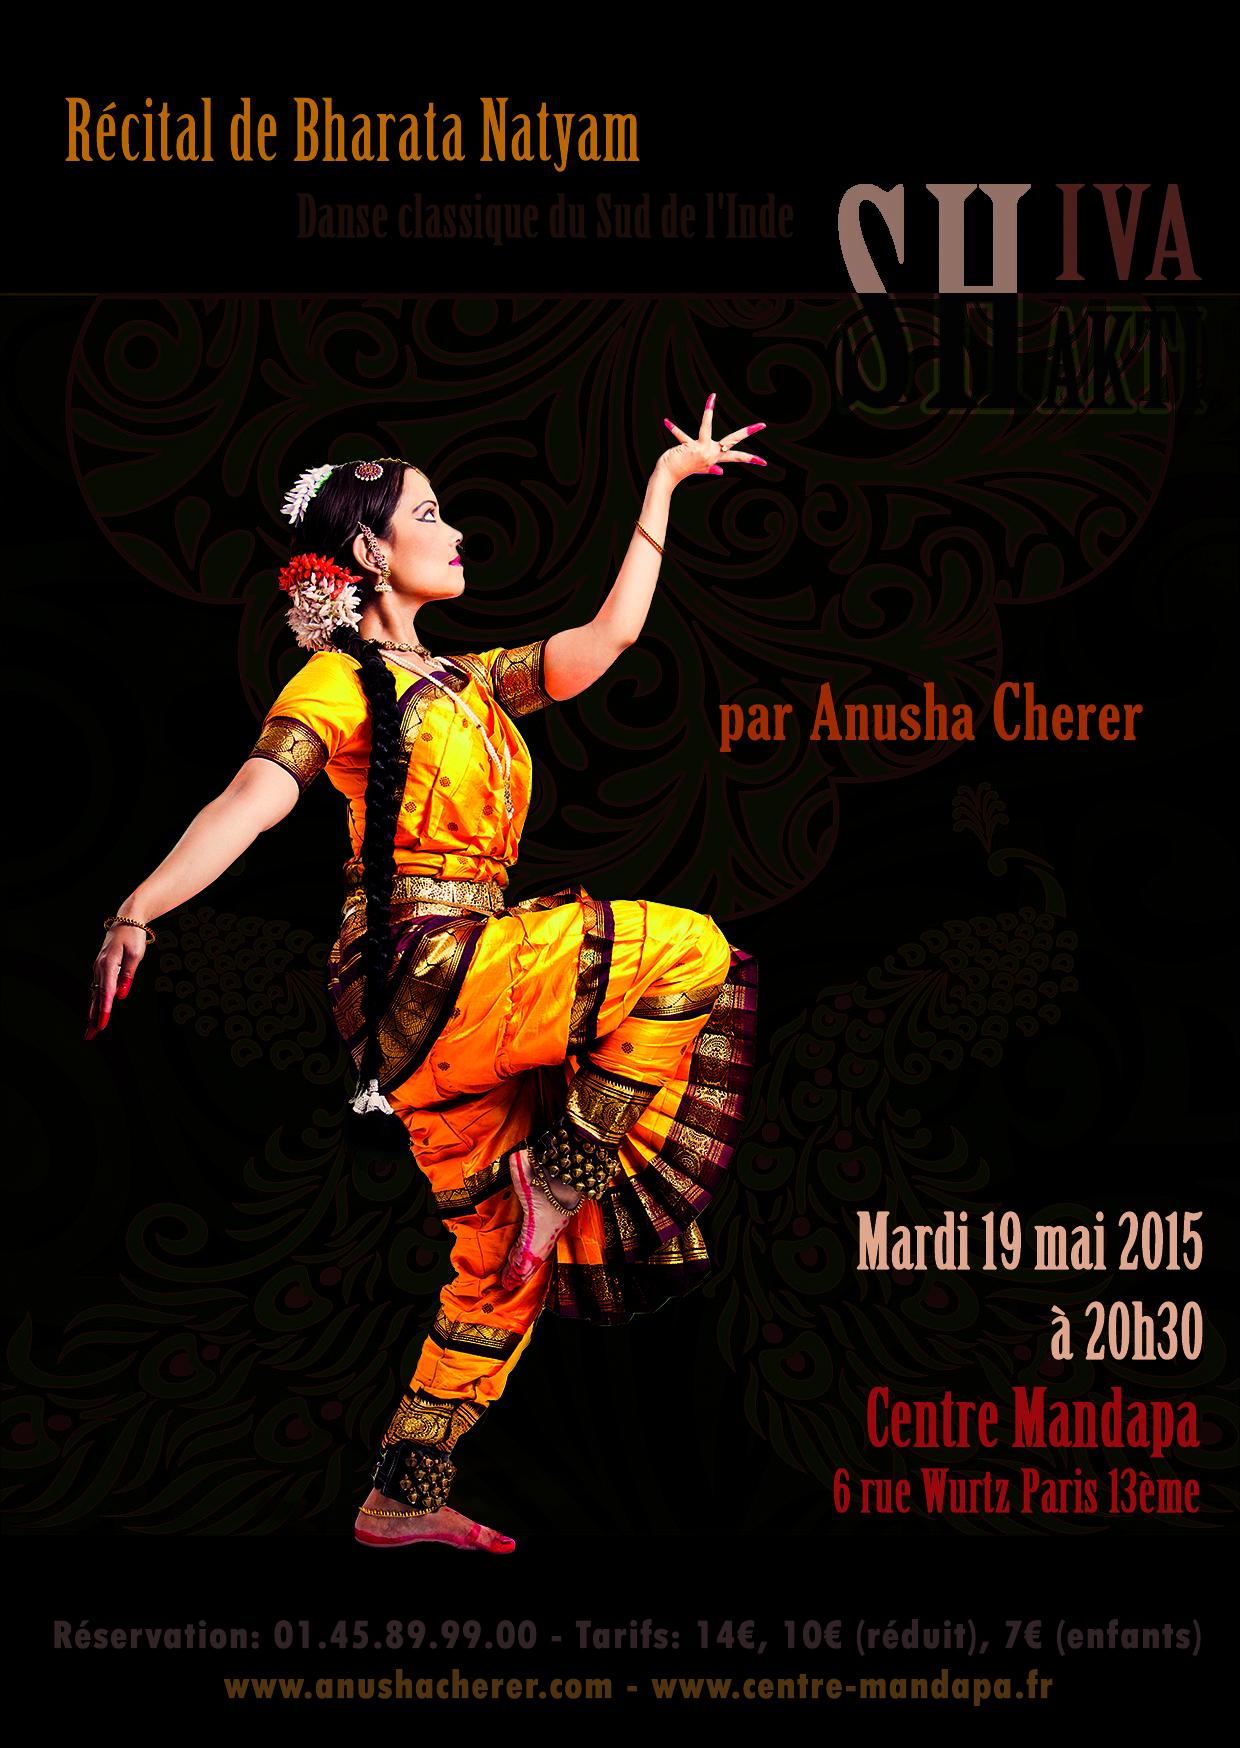 Anusha Cherer Récital